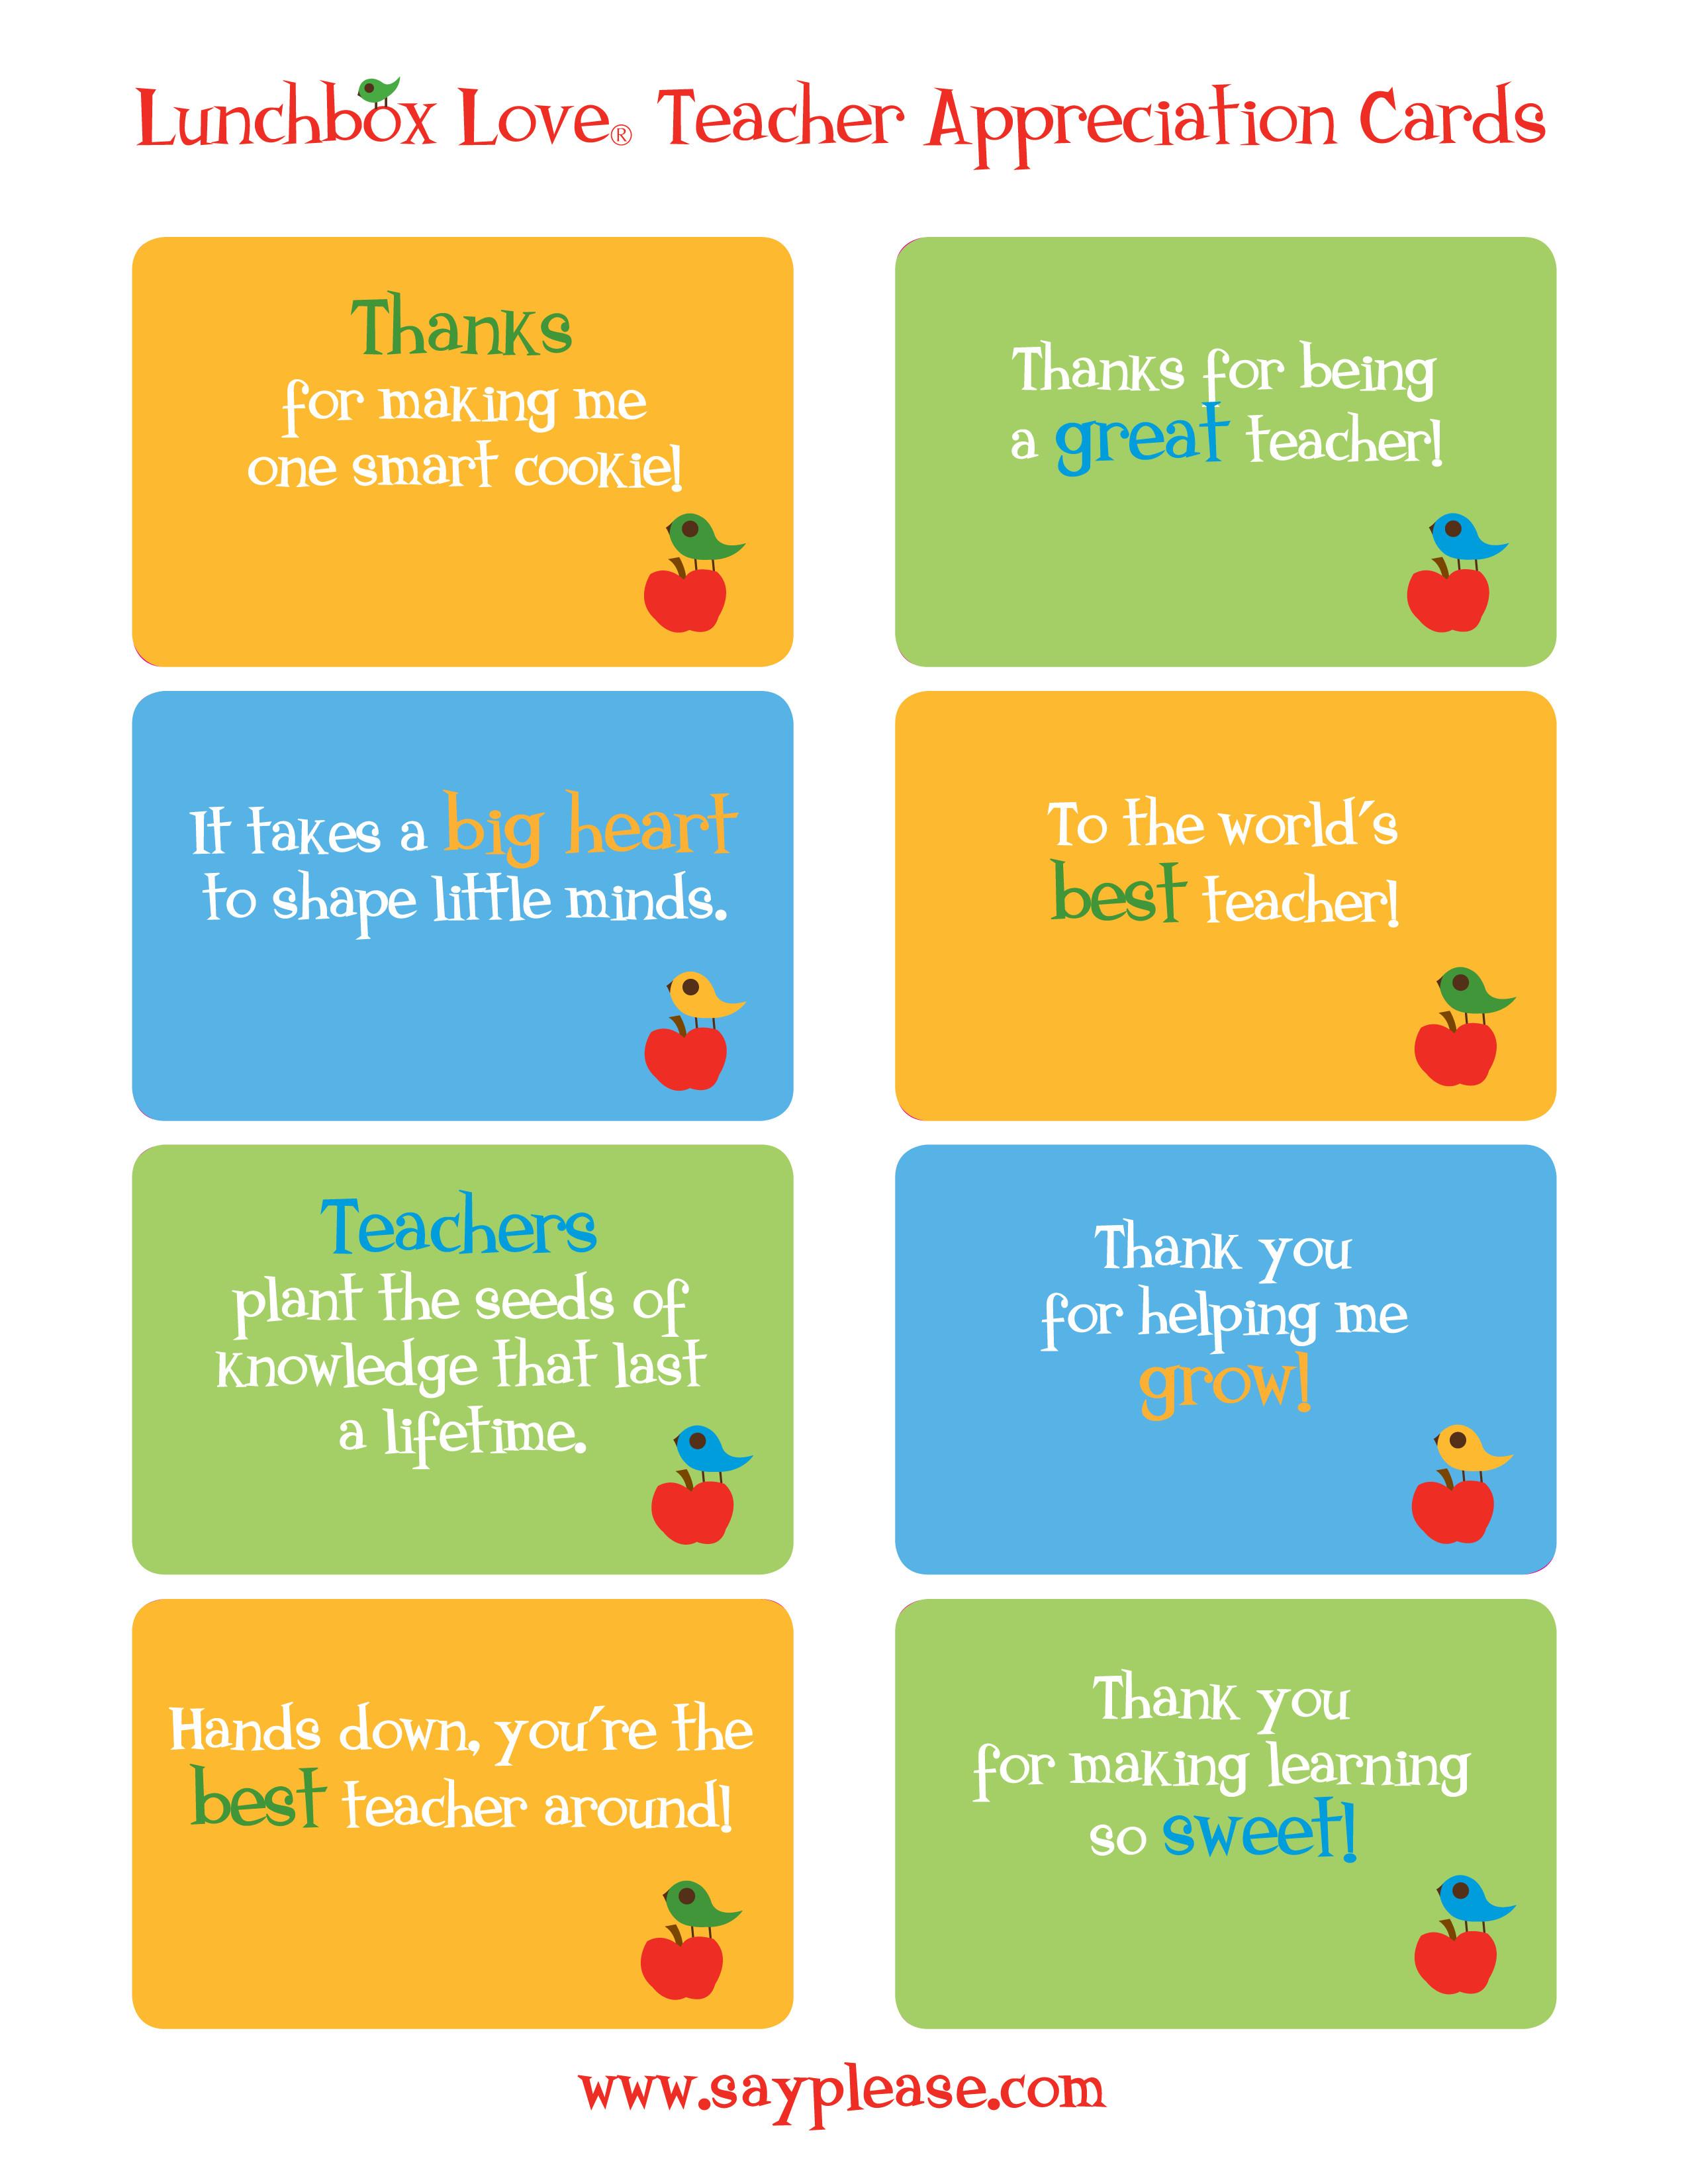 Free Printable Teacher Appreciation Cards To Say Thank You - Classy - Free Printable Teacher Appreciation Cards